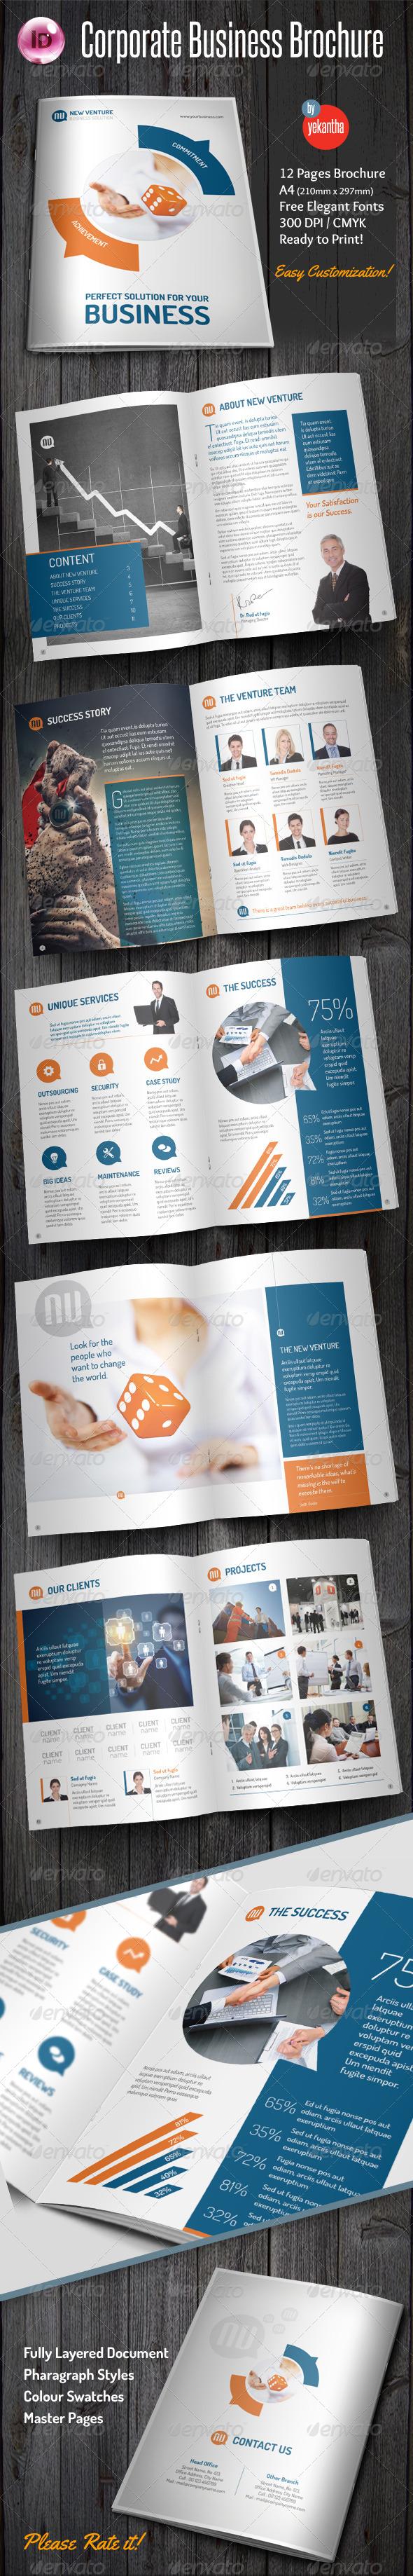 GraphicRiver Corporate Business Brochure 8046894